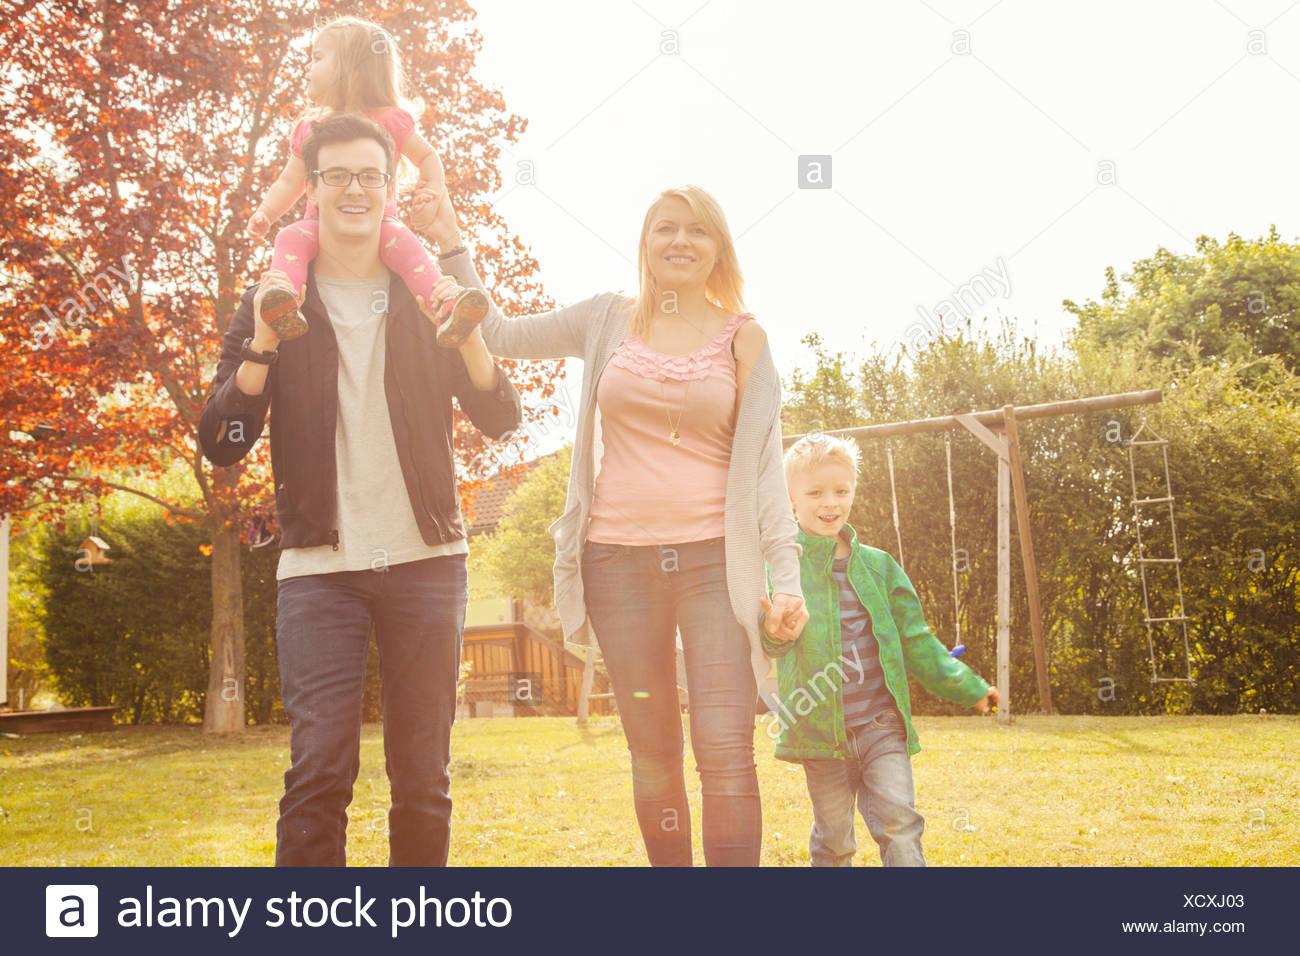 Family in garden, swings in background - Stock Image